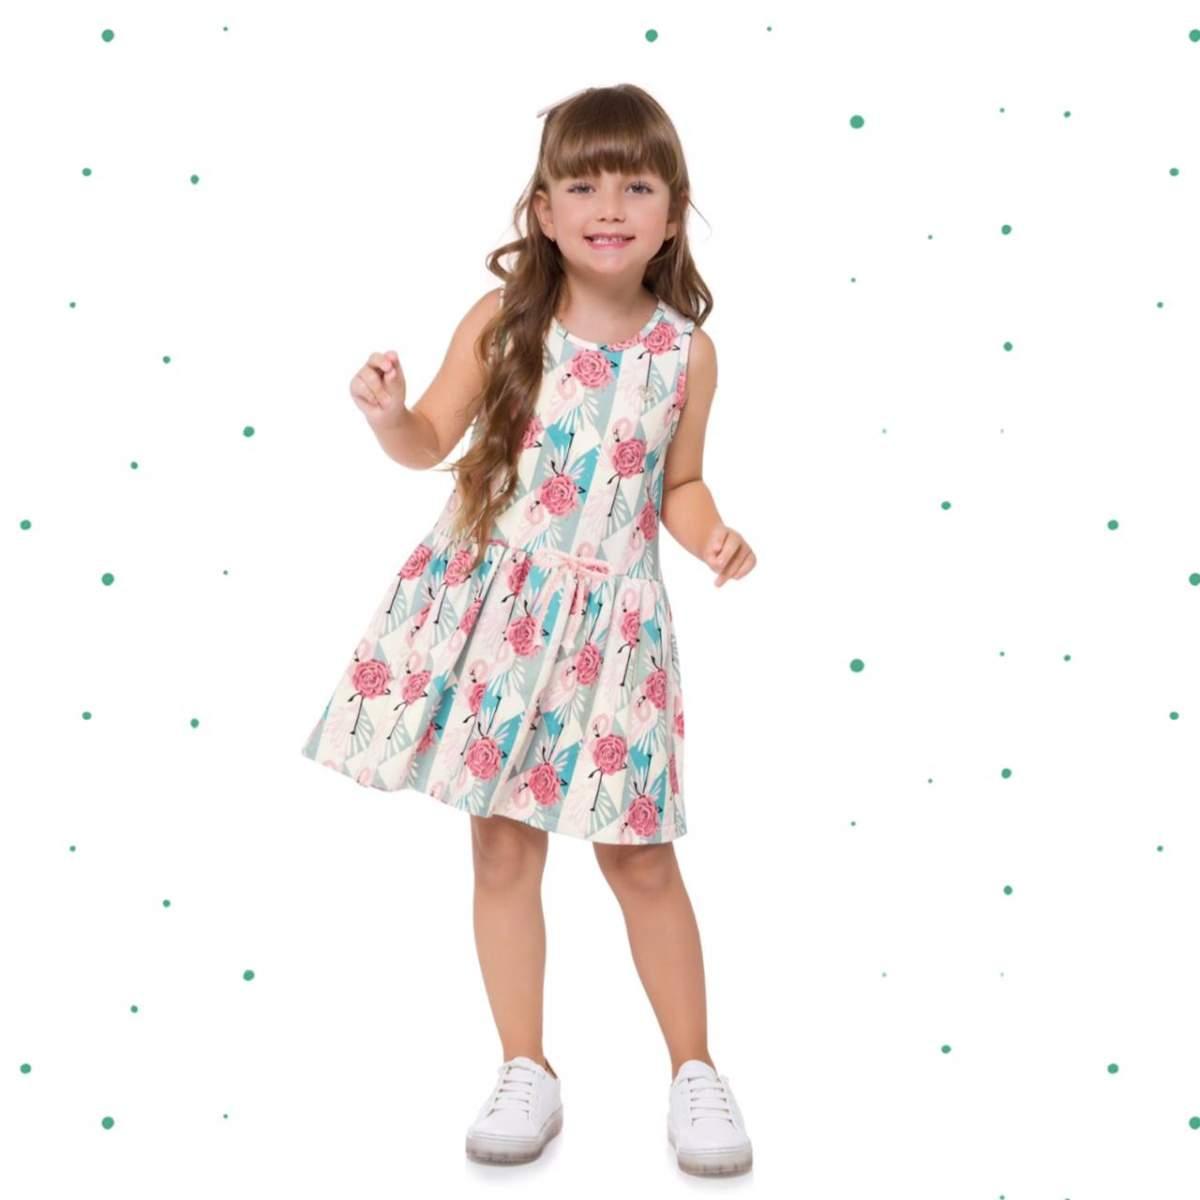 Vestido Infantil Milon em Moletinho Leve